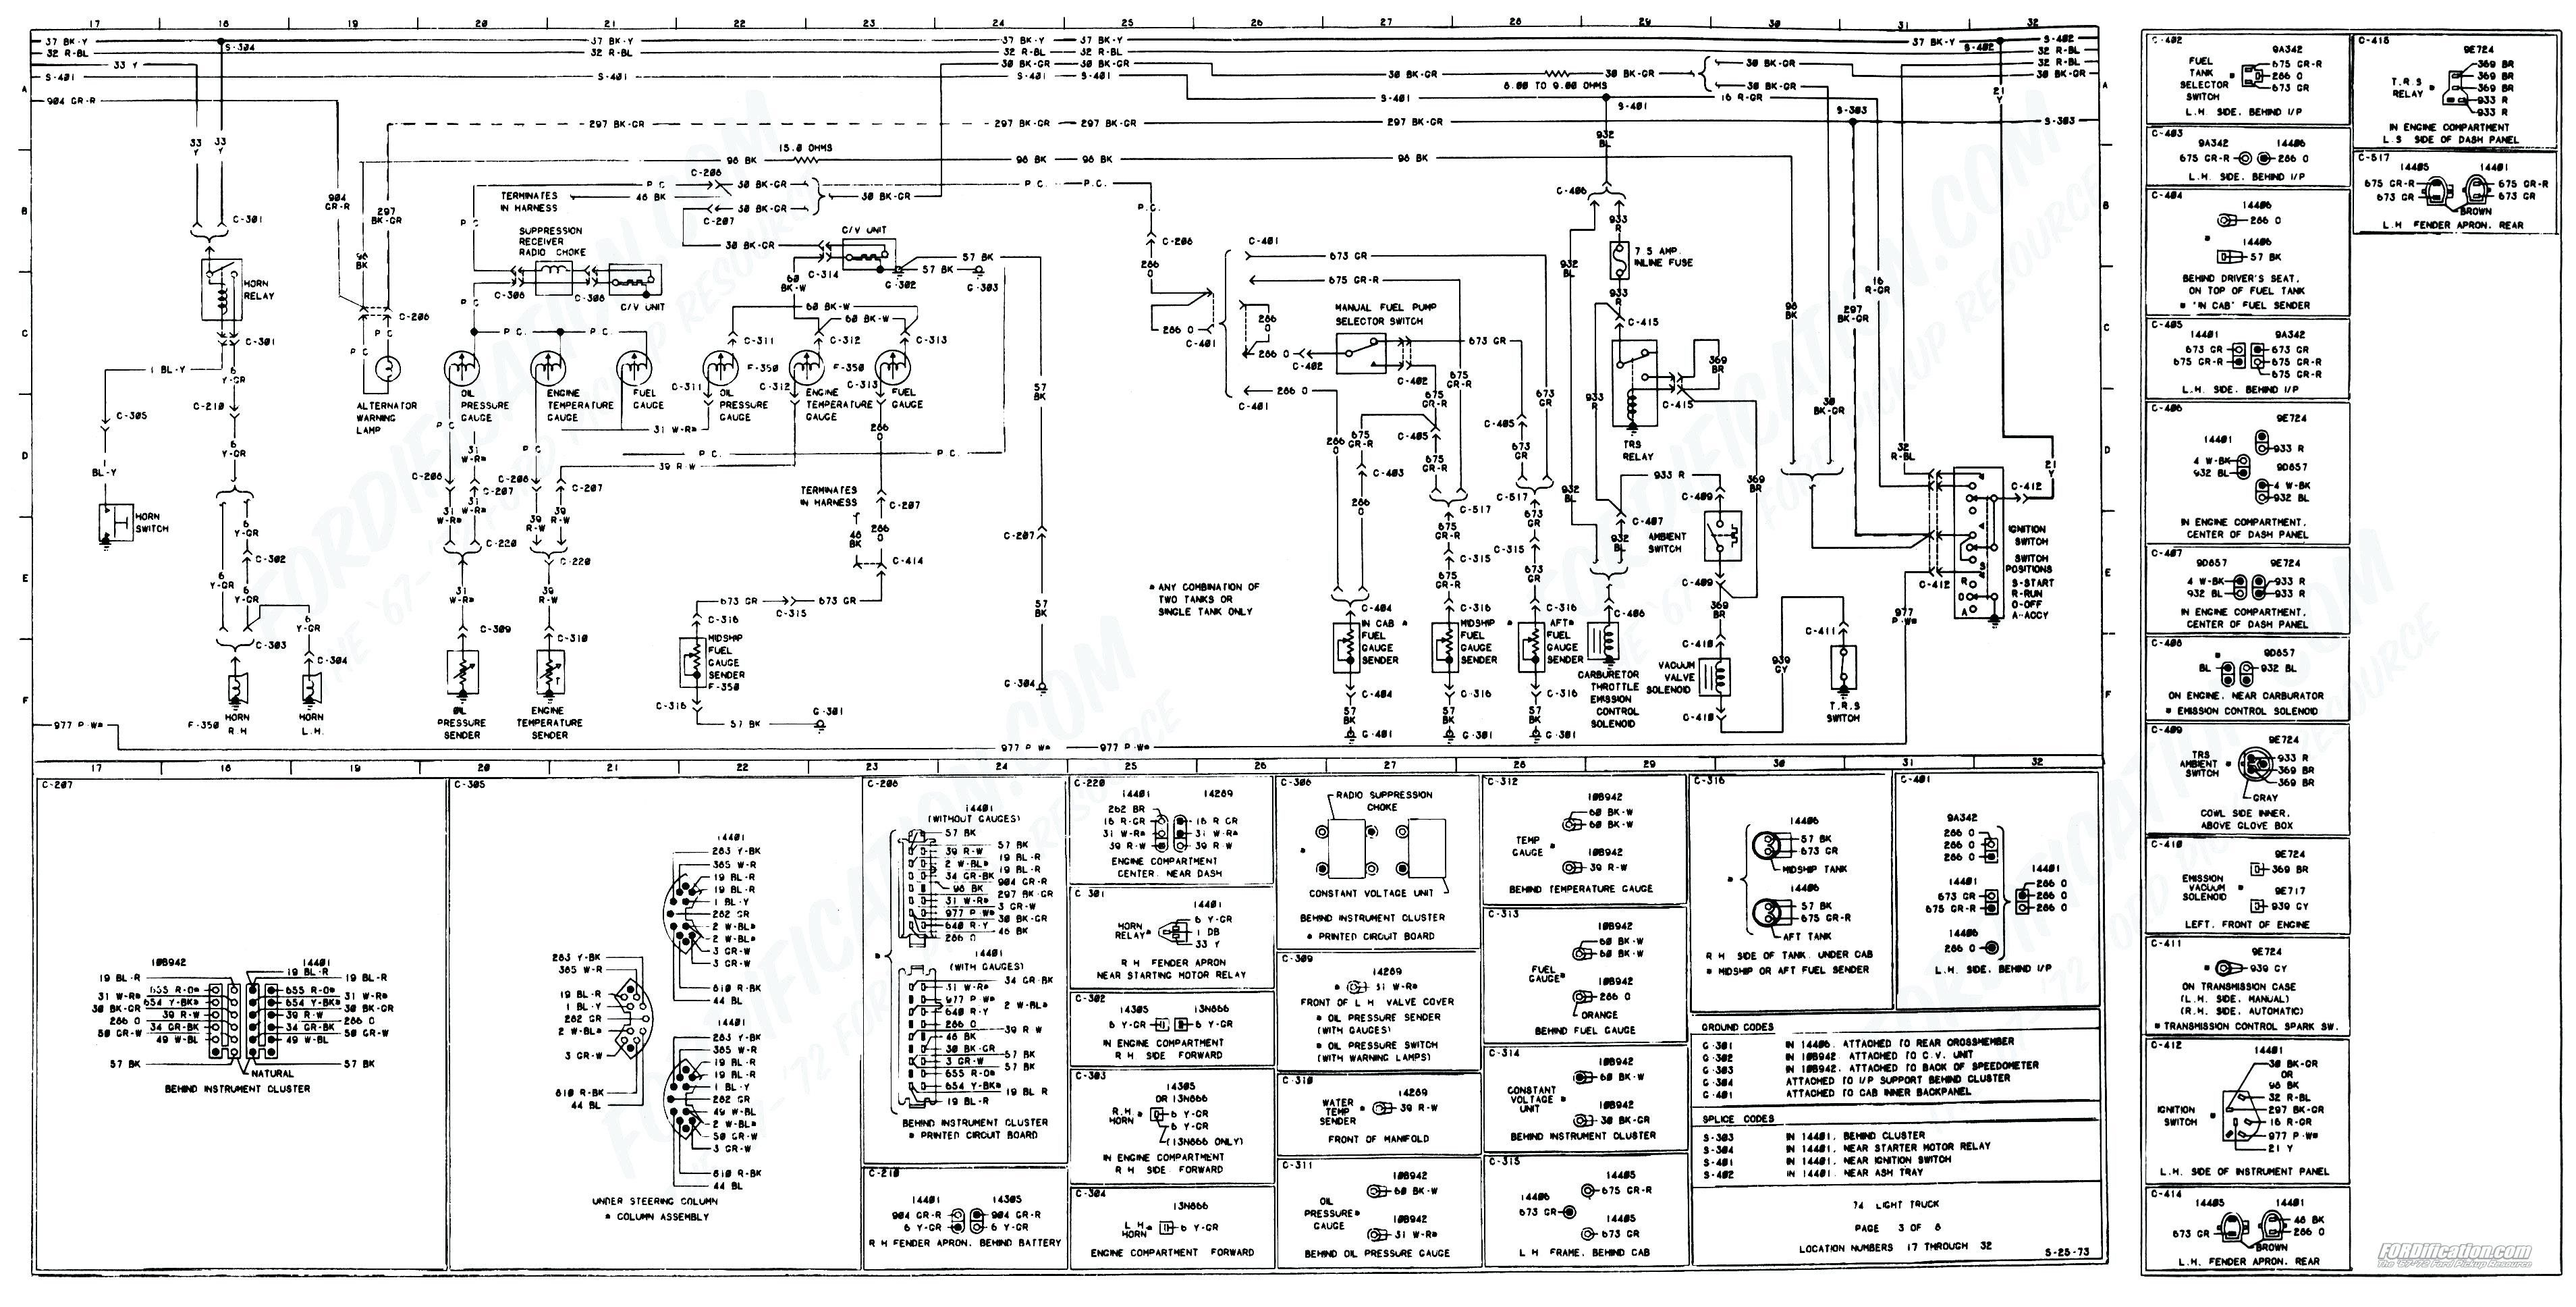 1979 Chevy Pickup Wiring Diagram